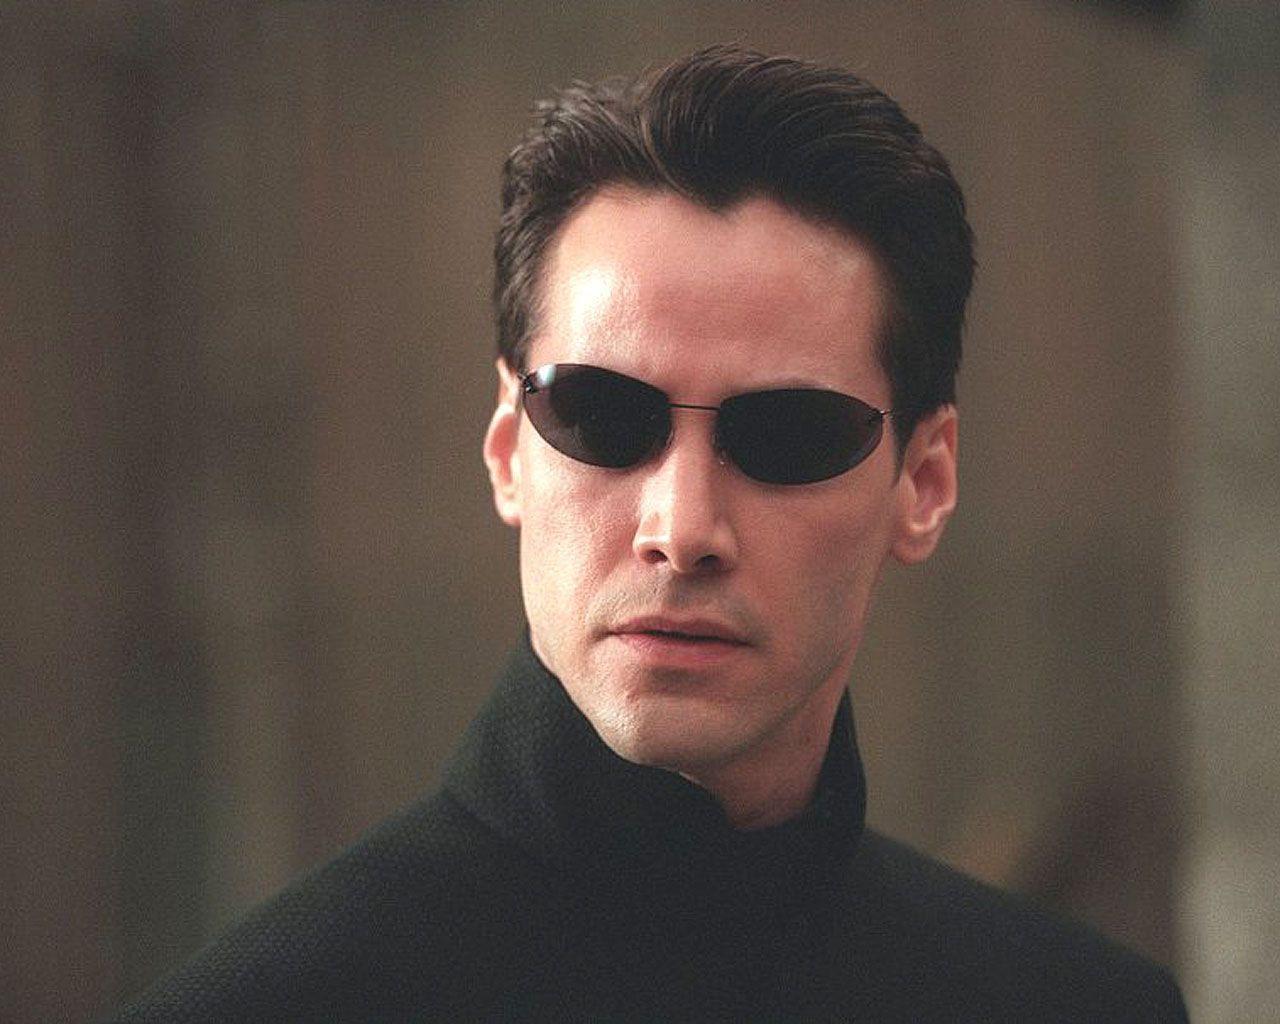 The Matrix wallpaper - Wallpapers - Movie extras - Movies - Virgin ...